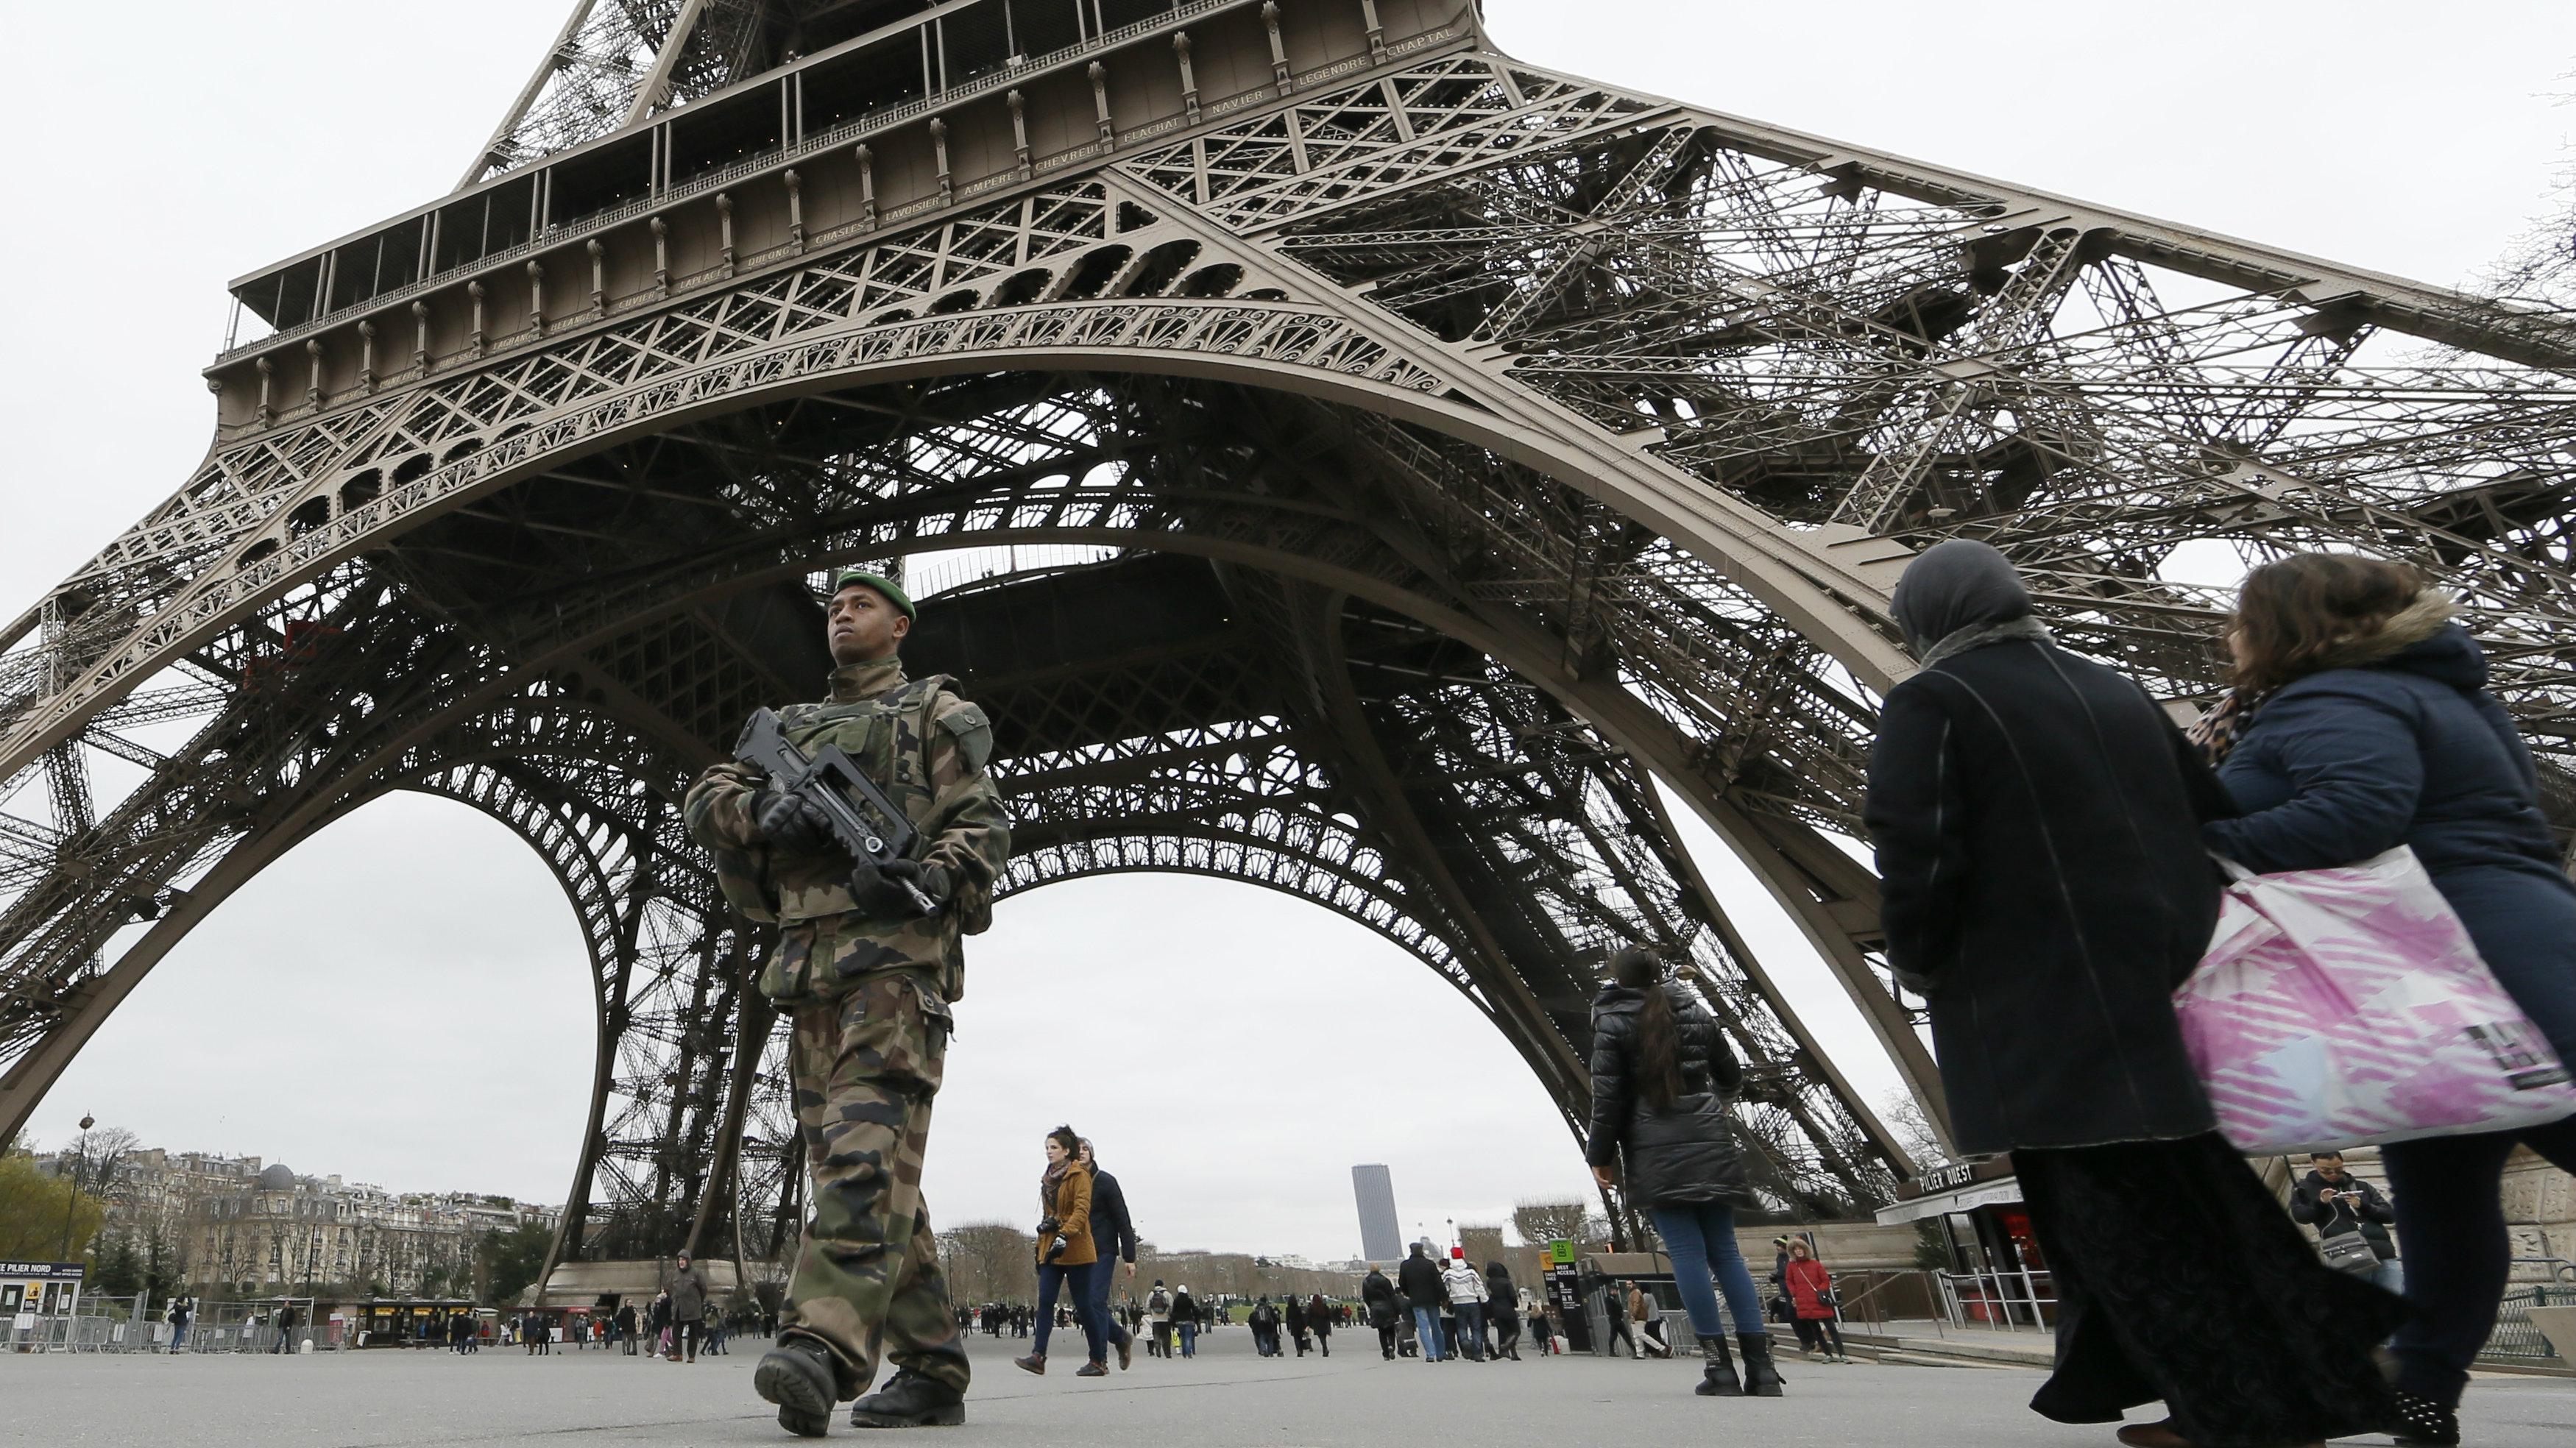 Eiffel Tower terrorism